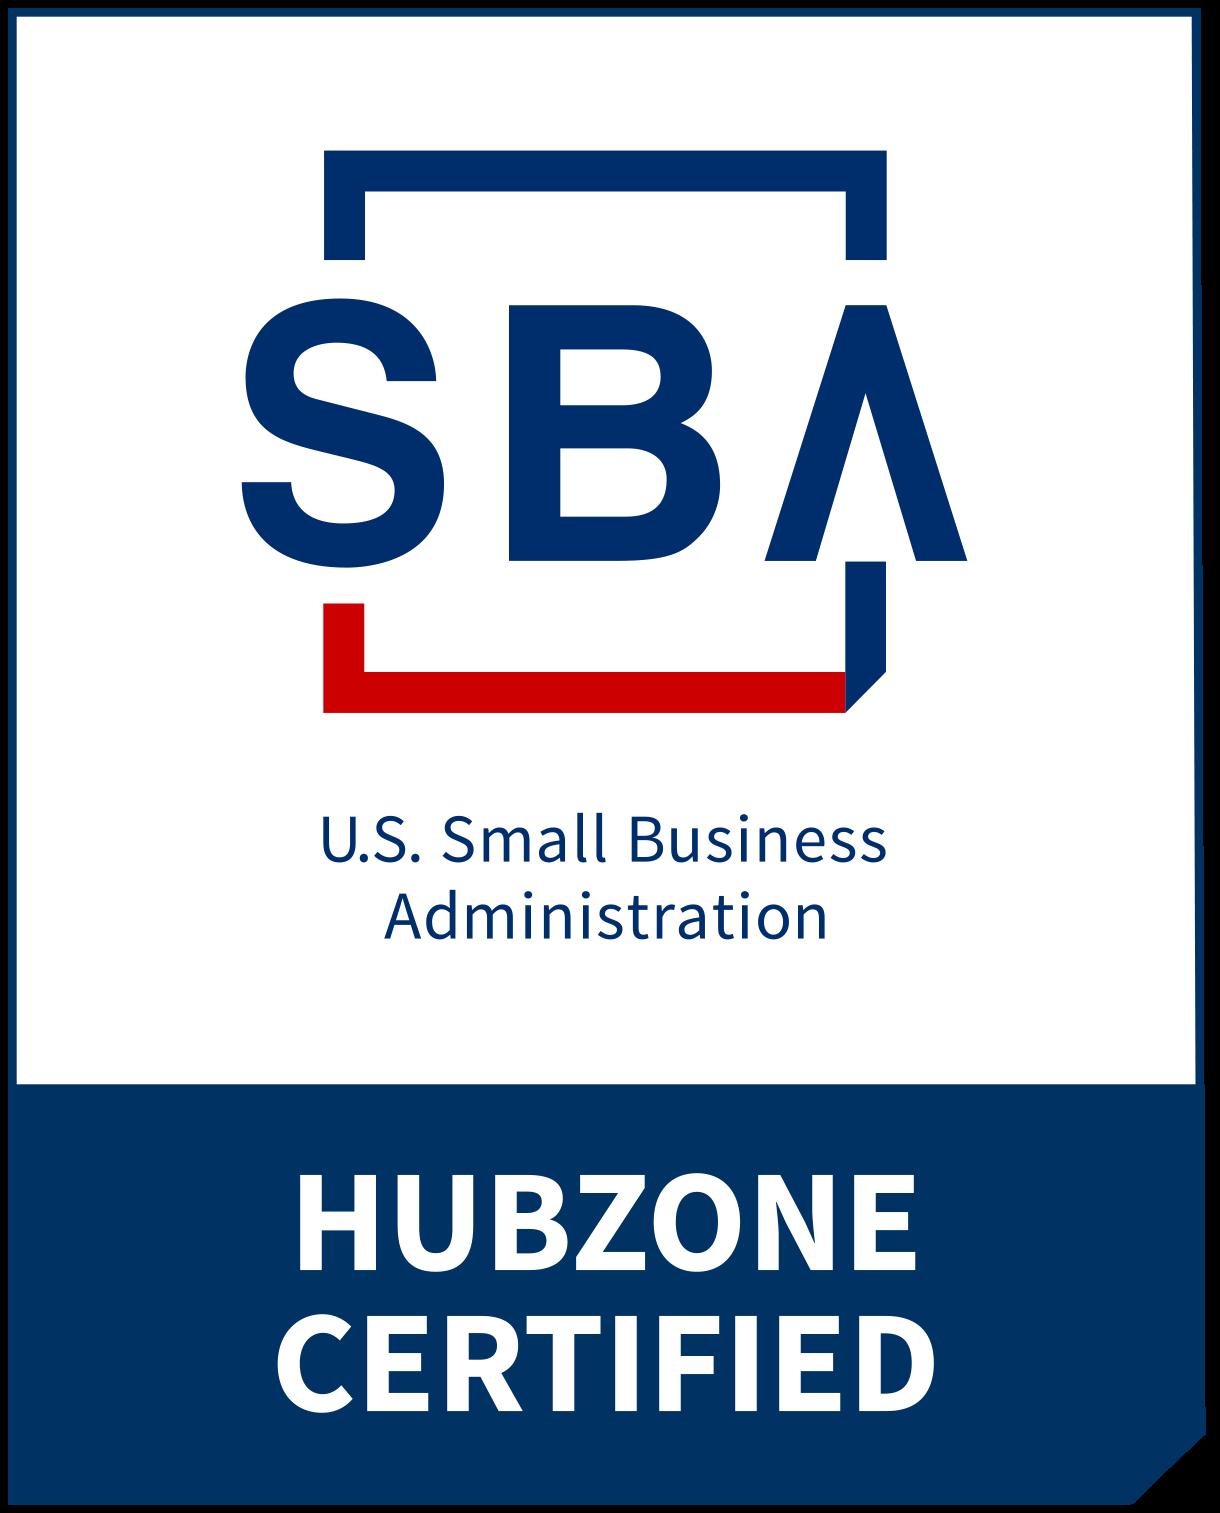 The System for Award Management Registered